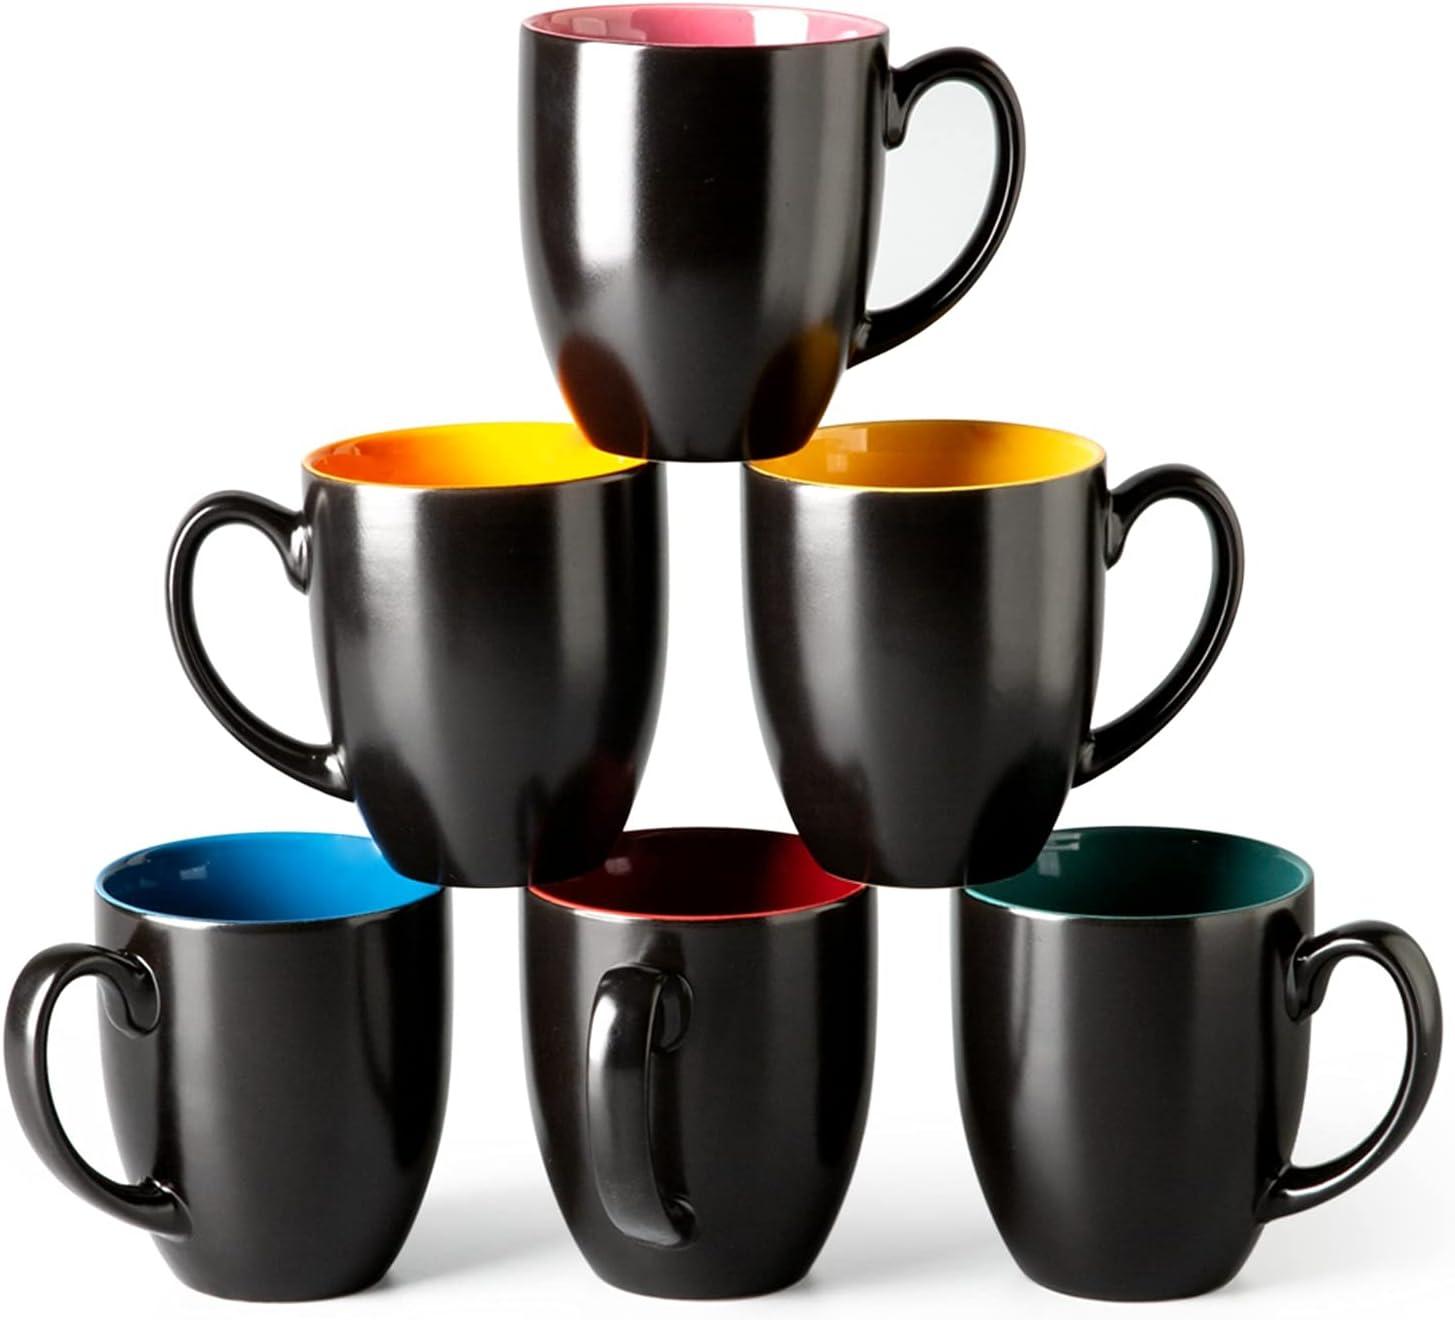 GBHOME Coffee Mugs Set Ranking TOP4 of 6 Mug Su Ceramic Ounce 17 Ranking TOP13